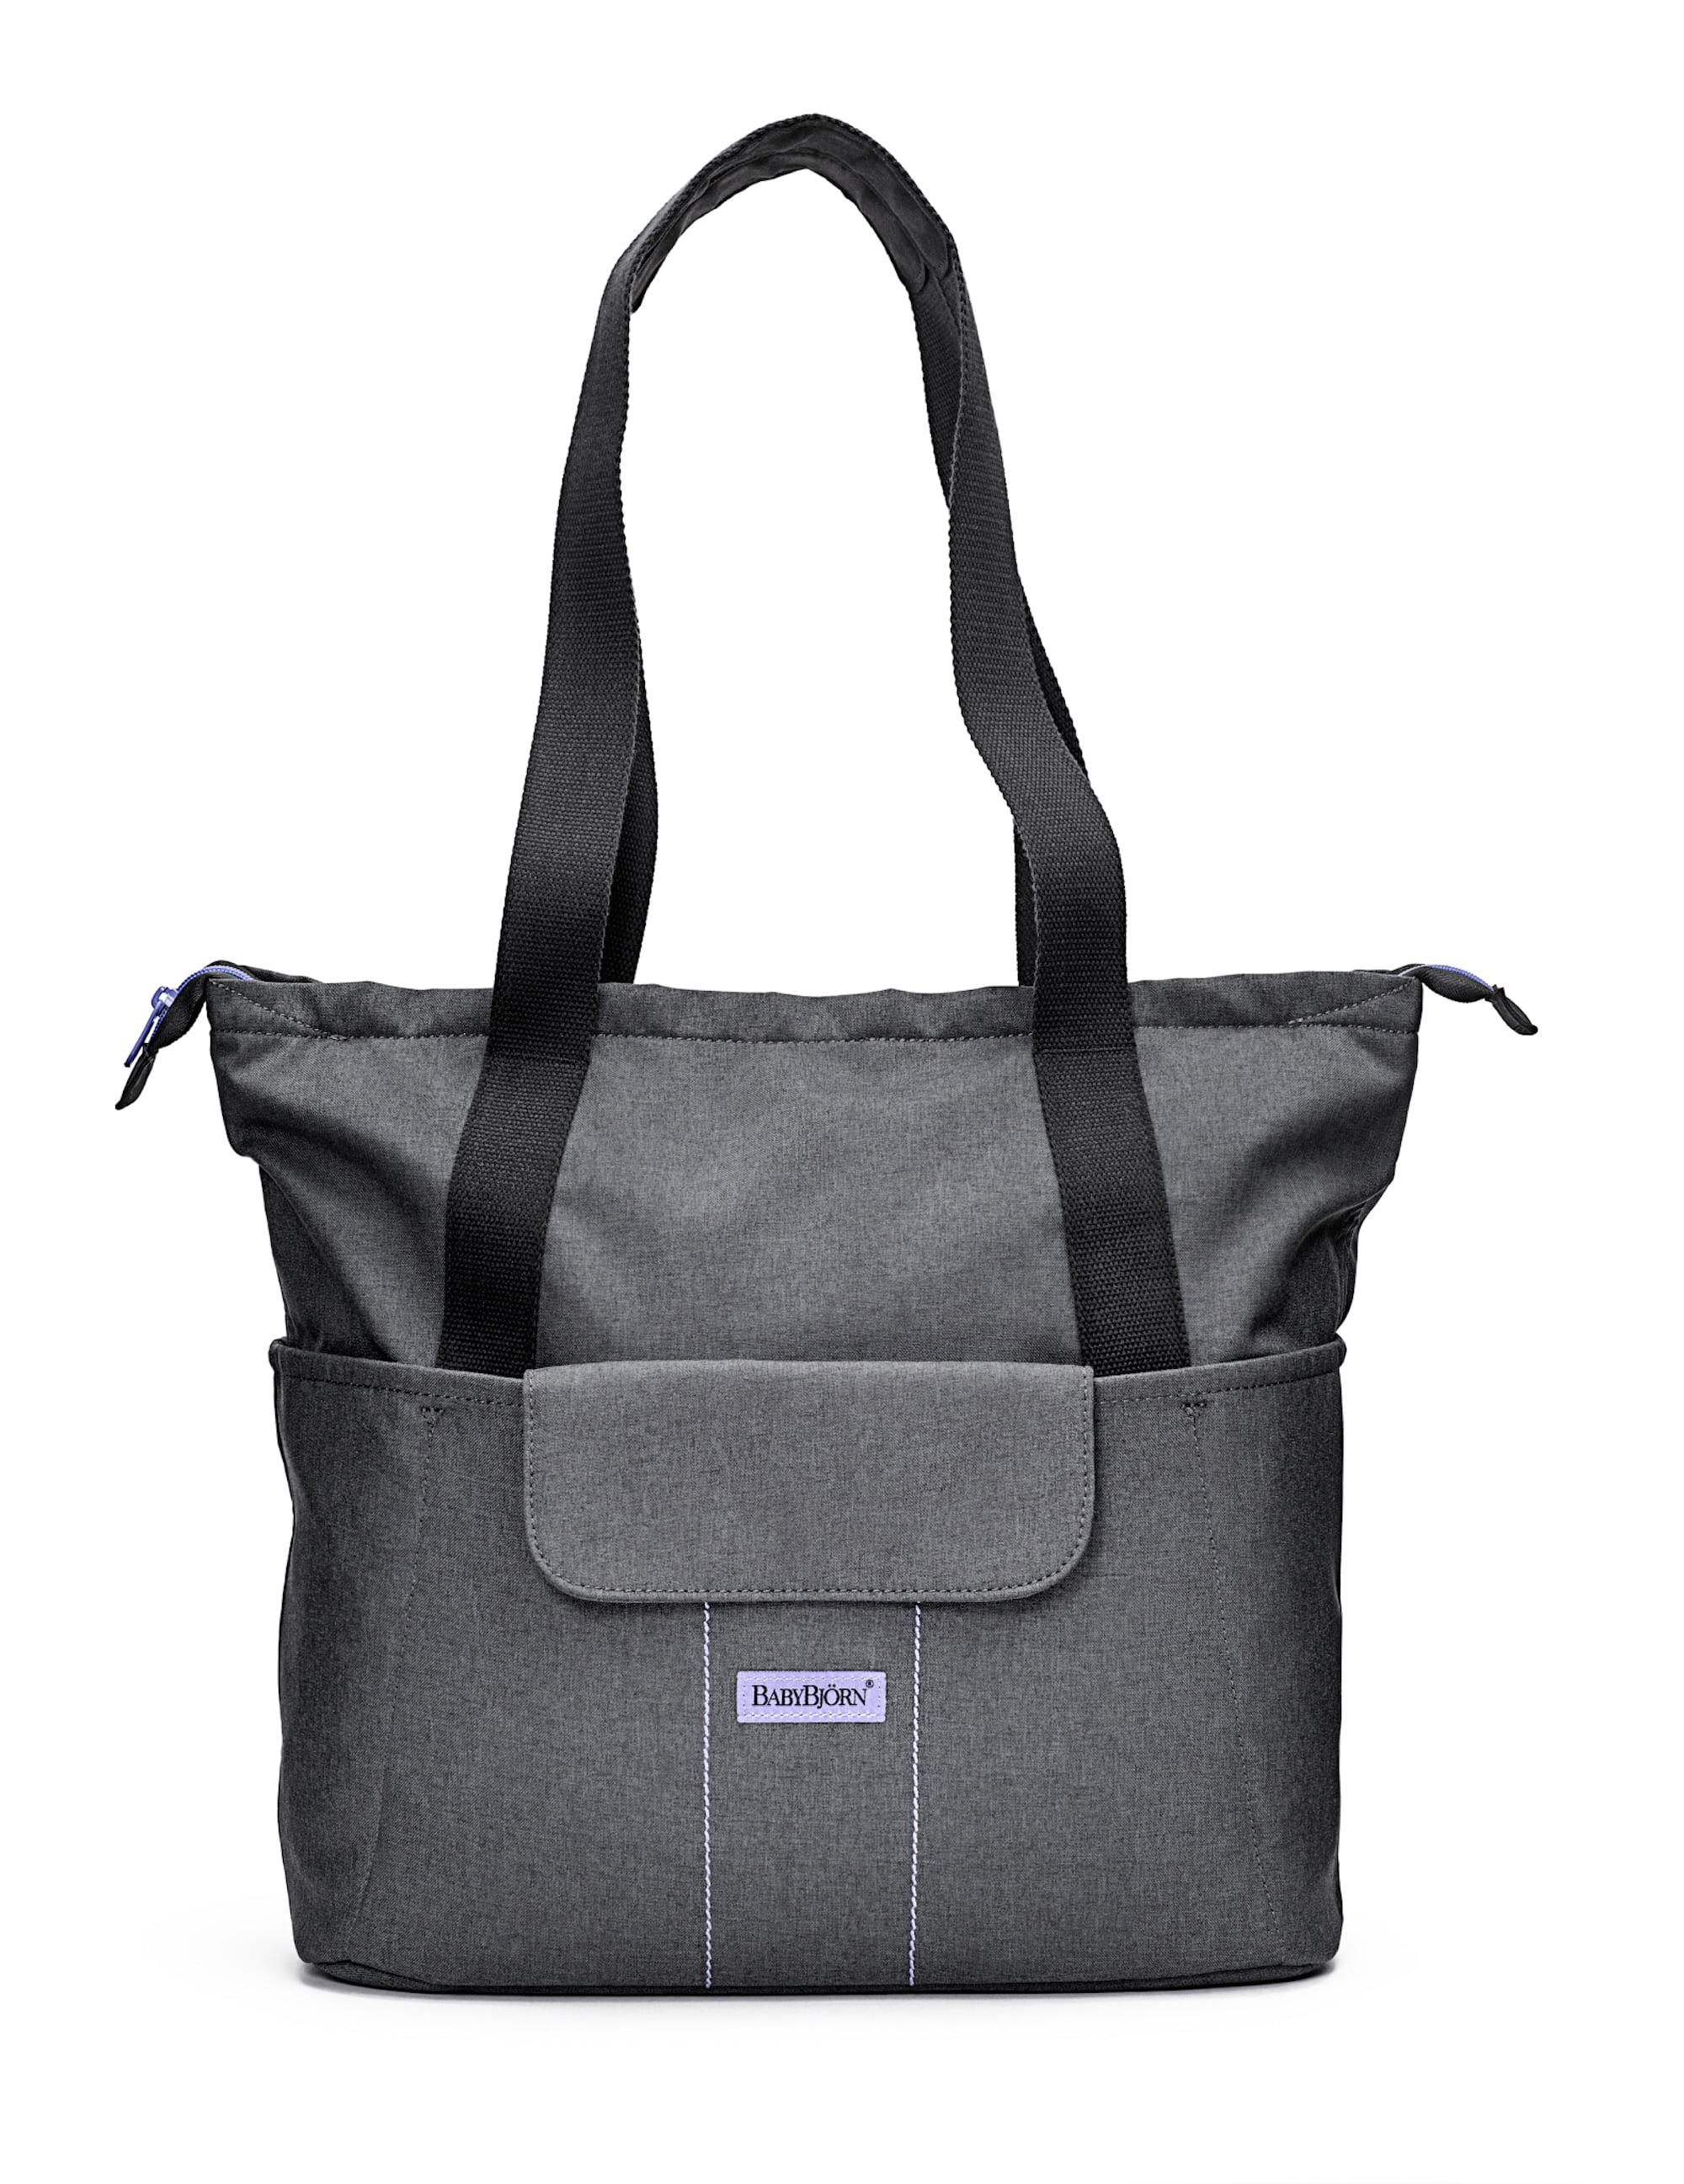 BabyBjorn Diaper Bag SoFo Gray Lavender by BabyBj%C3%B6rn